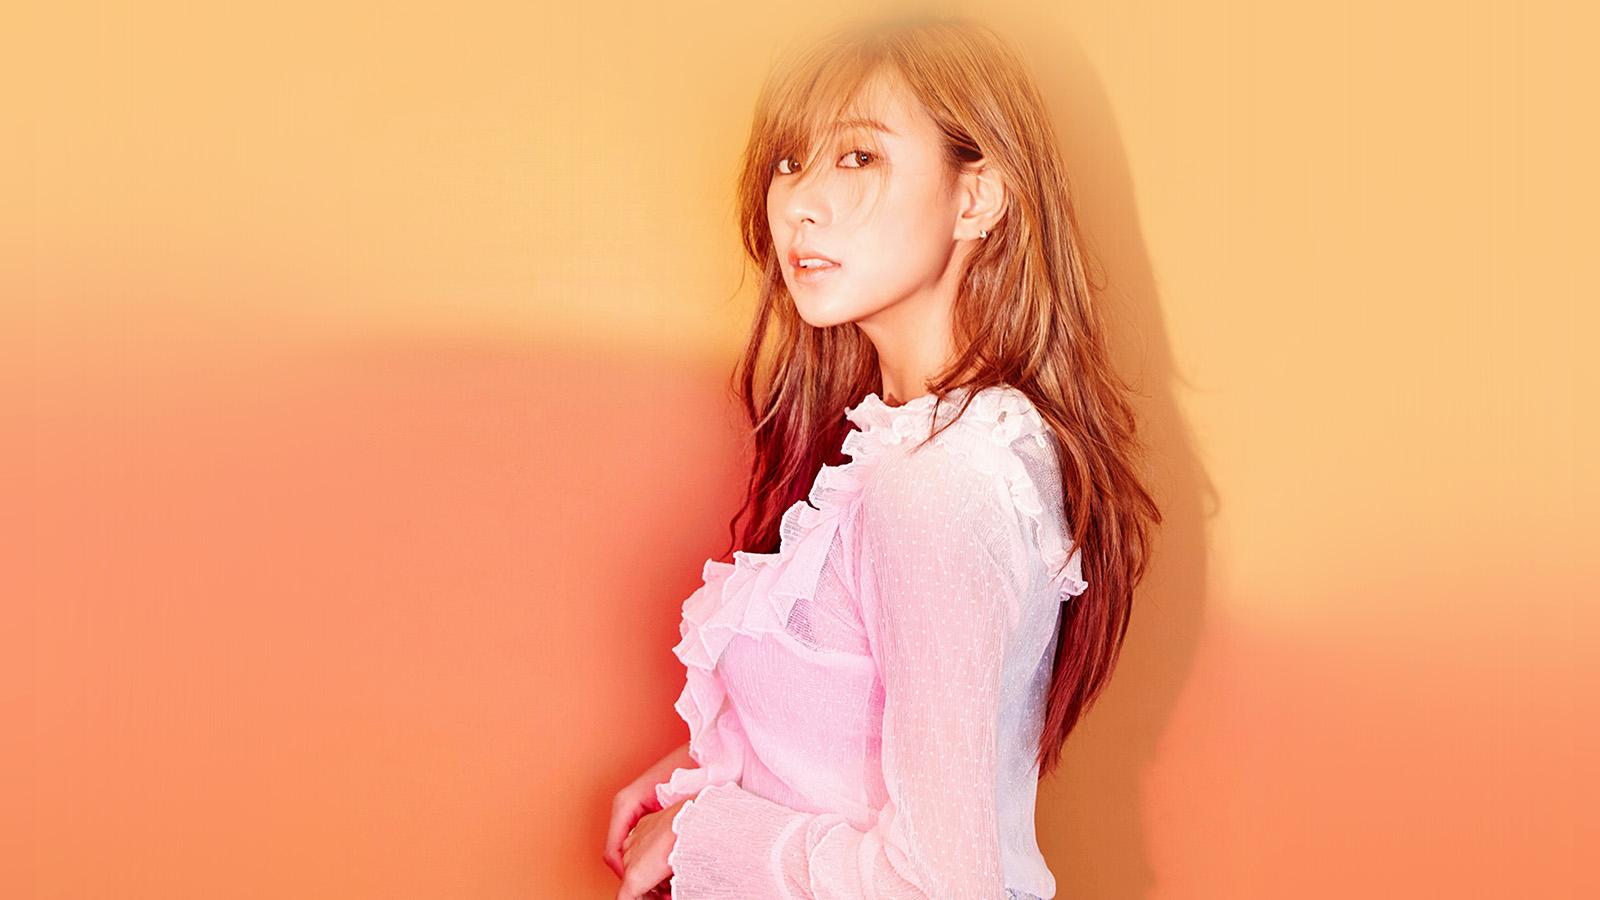 Hl12 Kpop Girl Apink Hayoung Orange Red Wallpaper